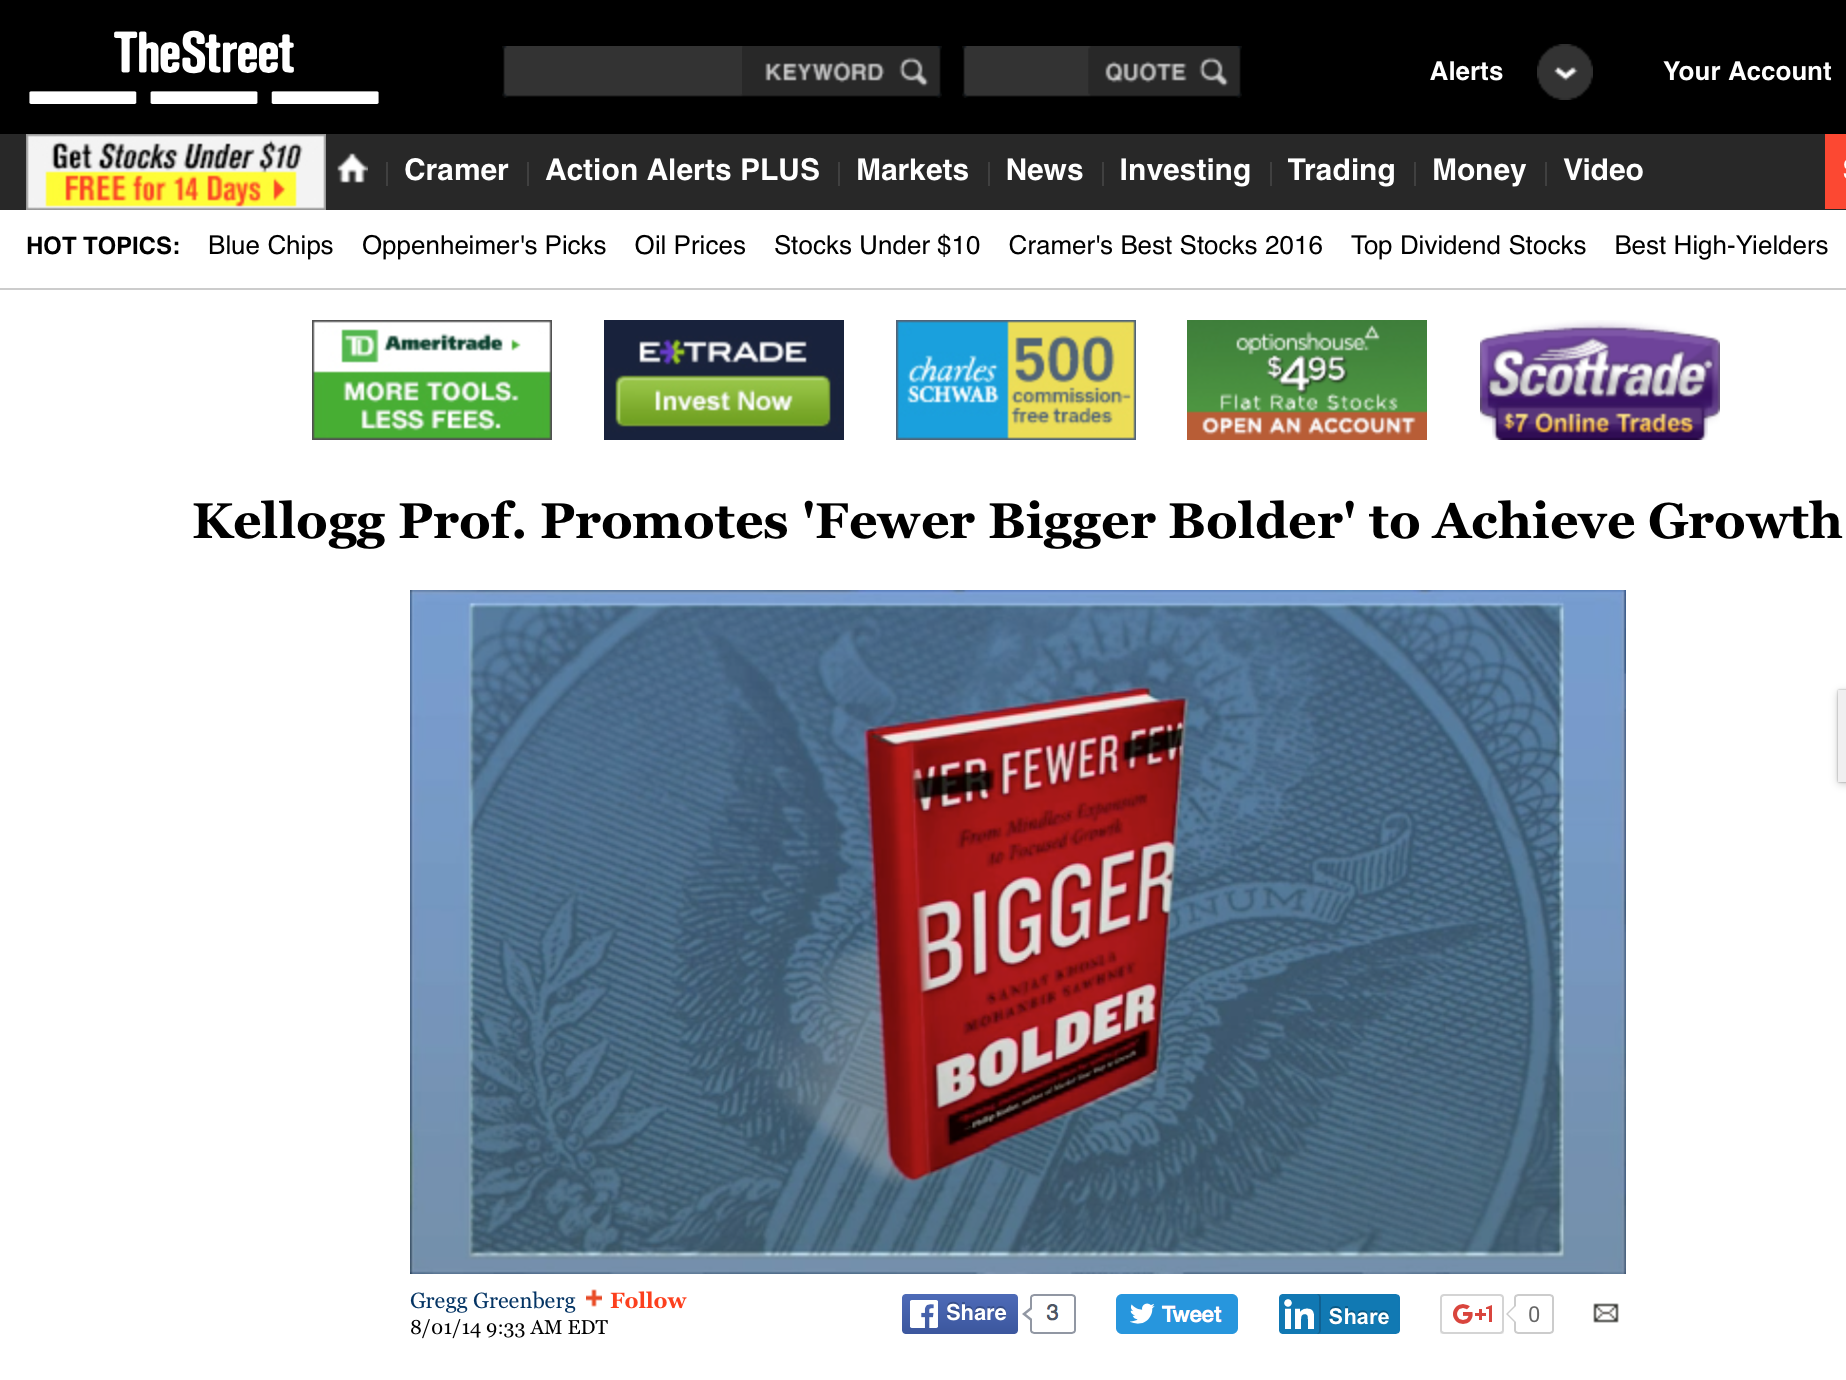 The Street - Fewer Bigger Bolder